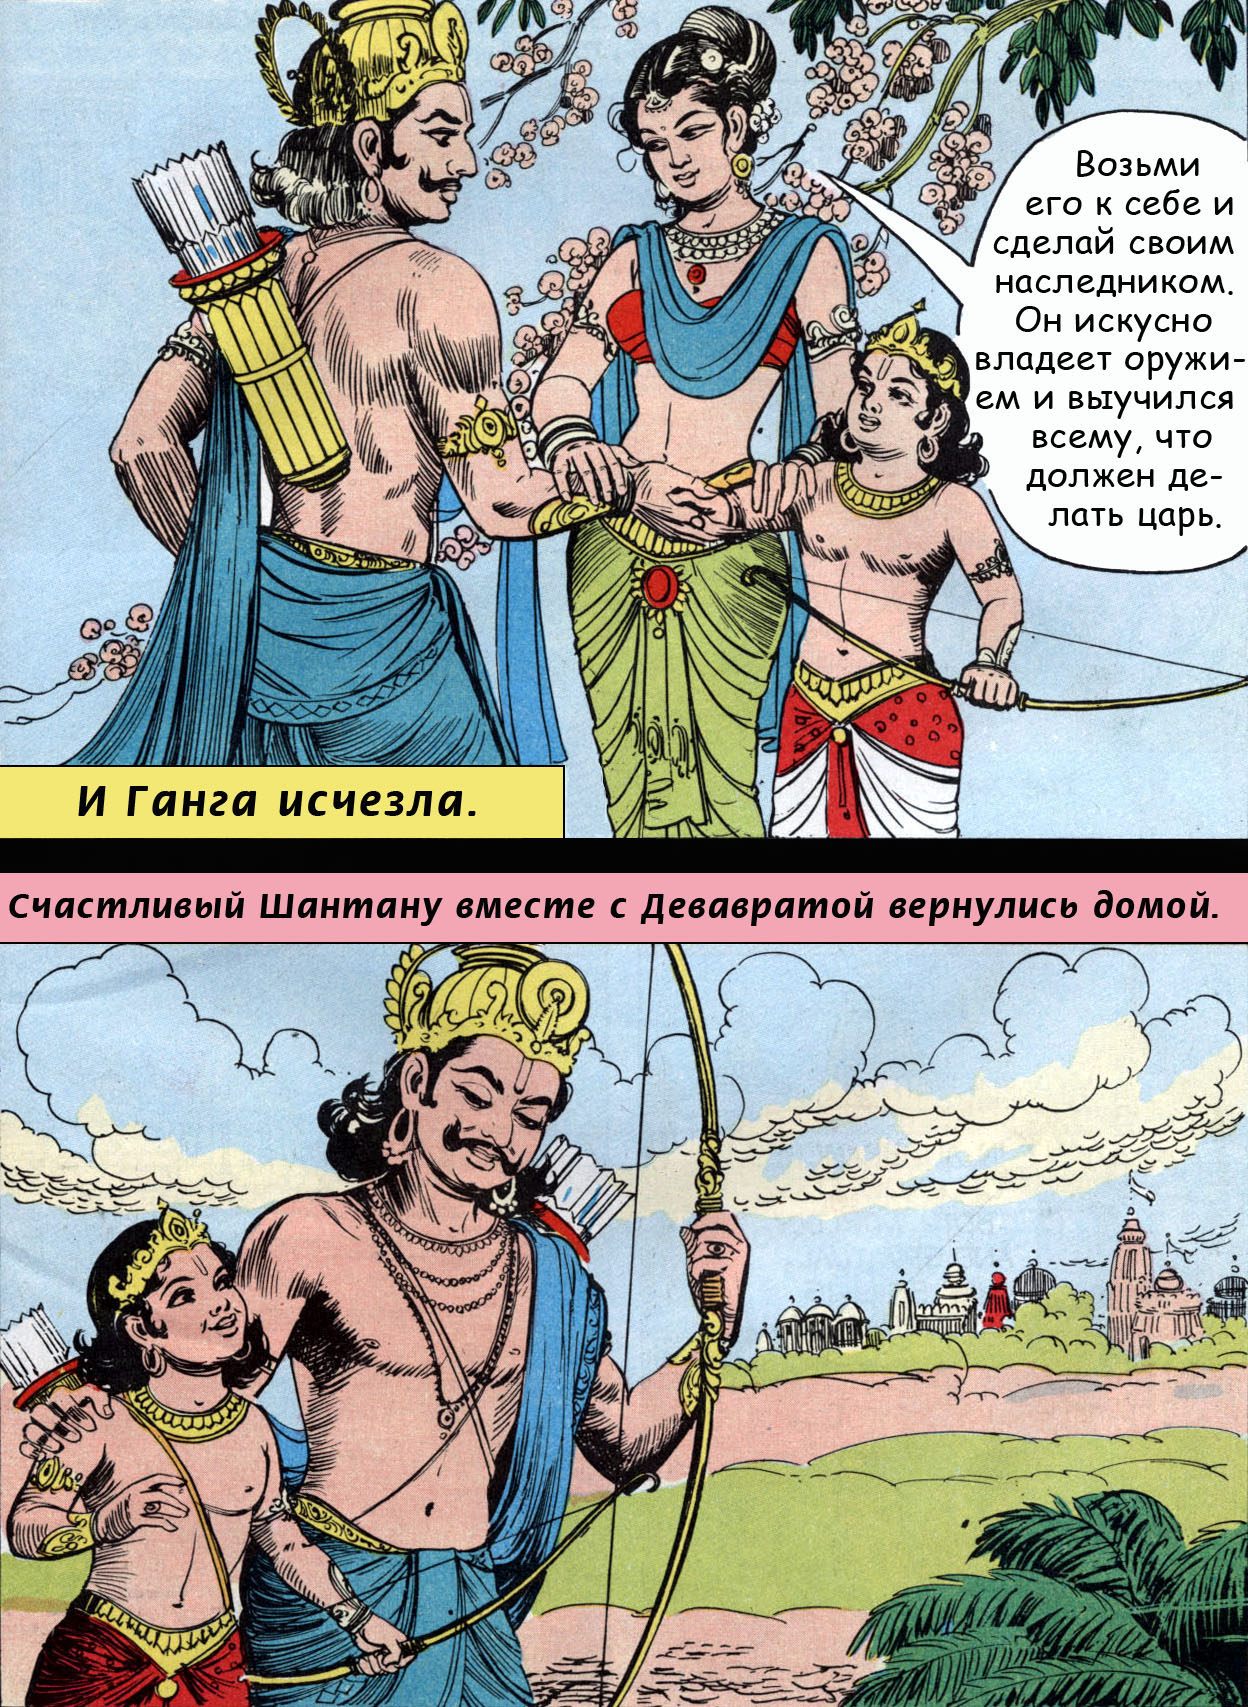 Бхишма 09 - ведический комикс